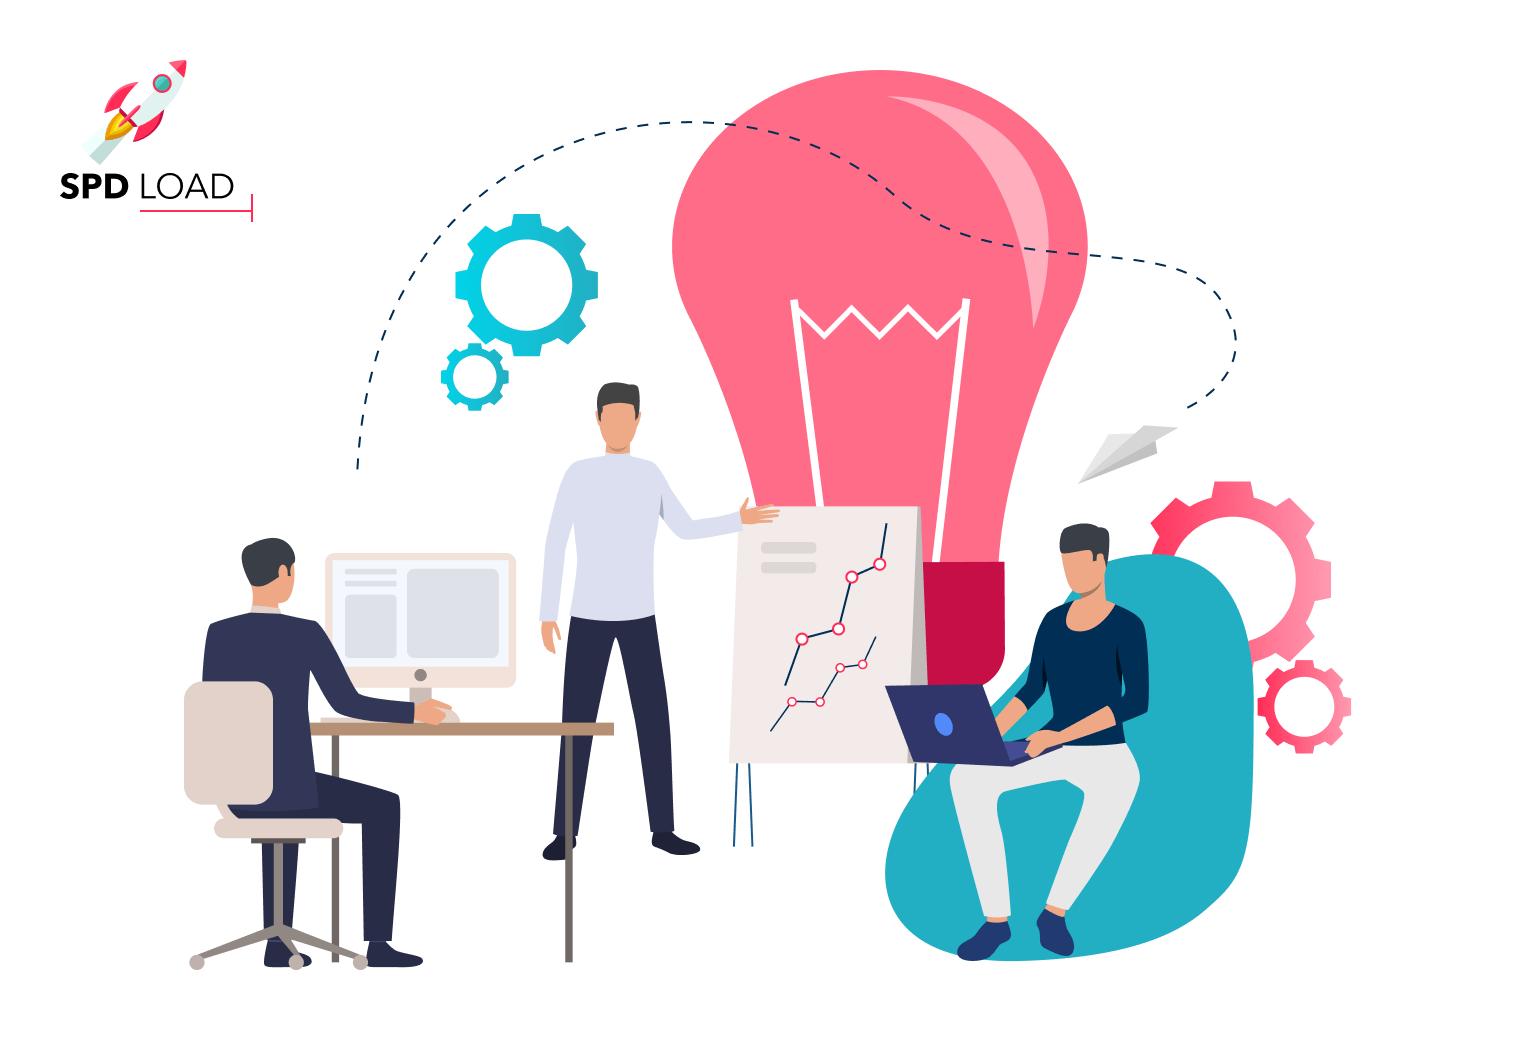 SpdLoad prepared in-depth guide for beginners in startup marketing